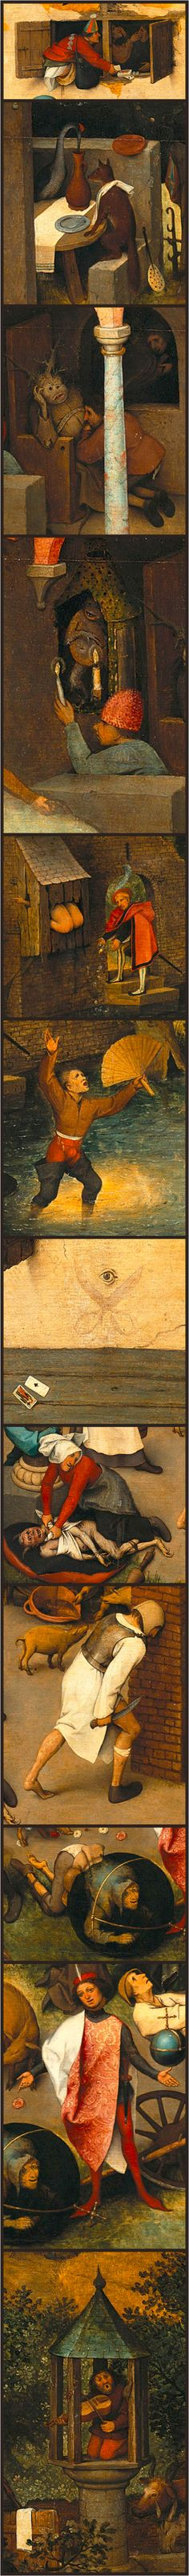 details from The Netherlandish Proverbs by Pieter Bruegel the Elder. Pieter Brueghel El Viejo, Pieter Bruegel The Elder, Symbolic Art, Google Art Project, Hieronymus Bosch, Renaissance Paintings, Illustration Art, Illustrations, European Paintings